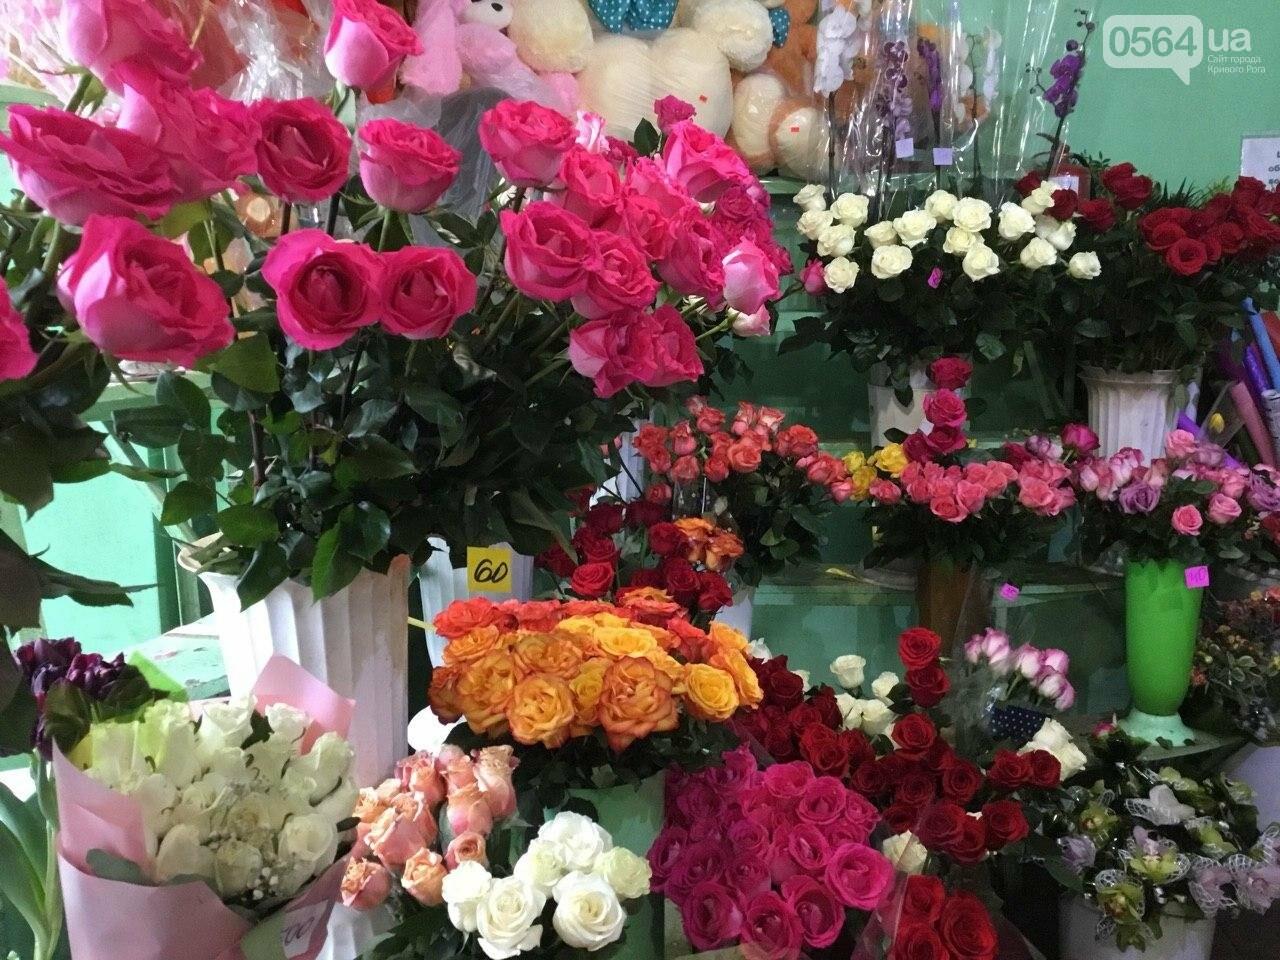 Сколько стоят примула, цикламен, мимоза? Обзор цен на цветы в Кривом Роге, - ФОТО, ВИДЕО, фото-19